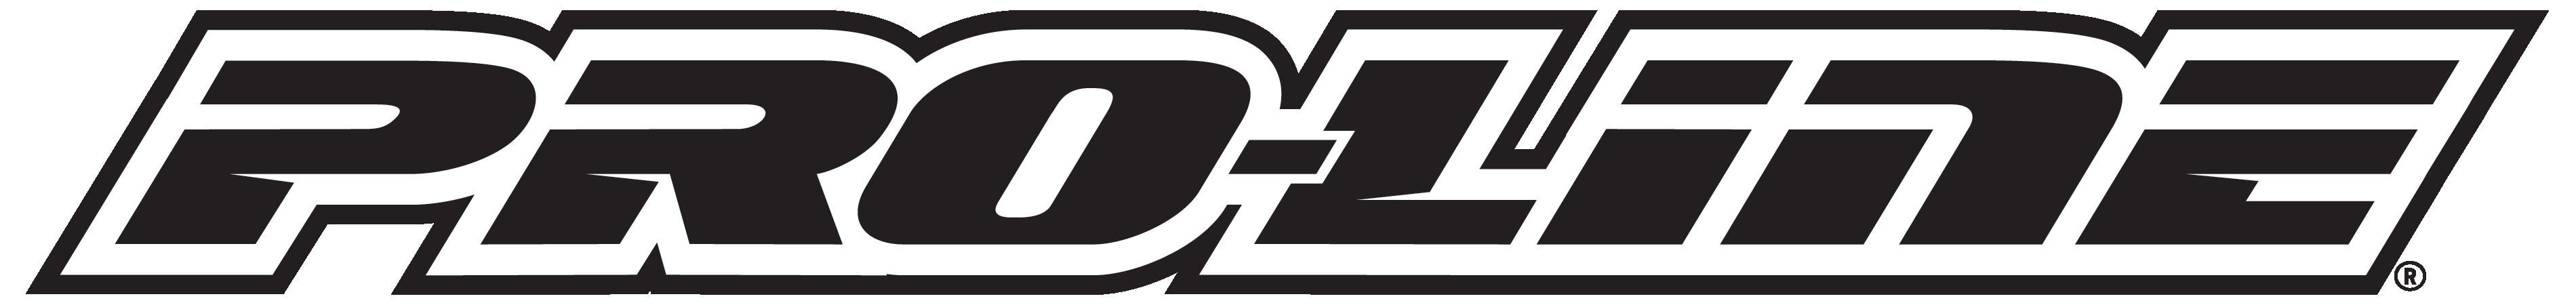 Logo Ama Pro Racing Png - Png Hdpng.com , Transparent background PNG HD thumbnail